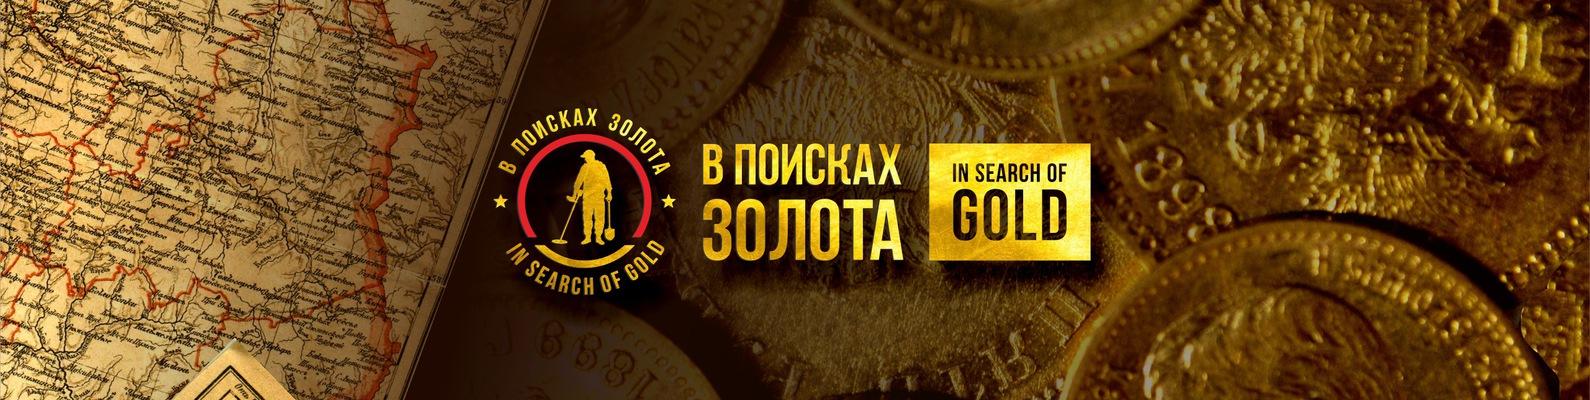 Золото перезагрузка